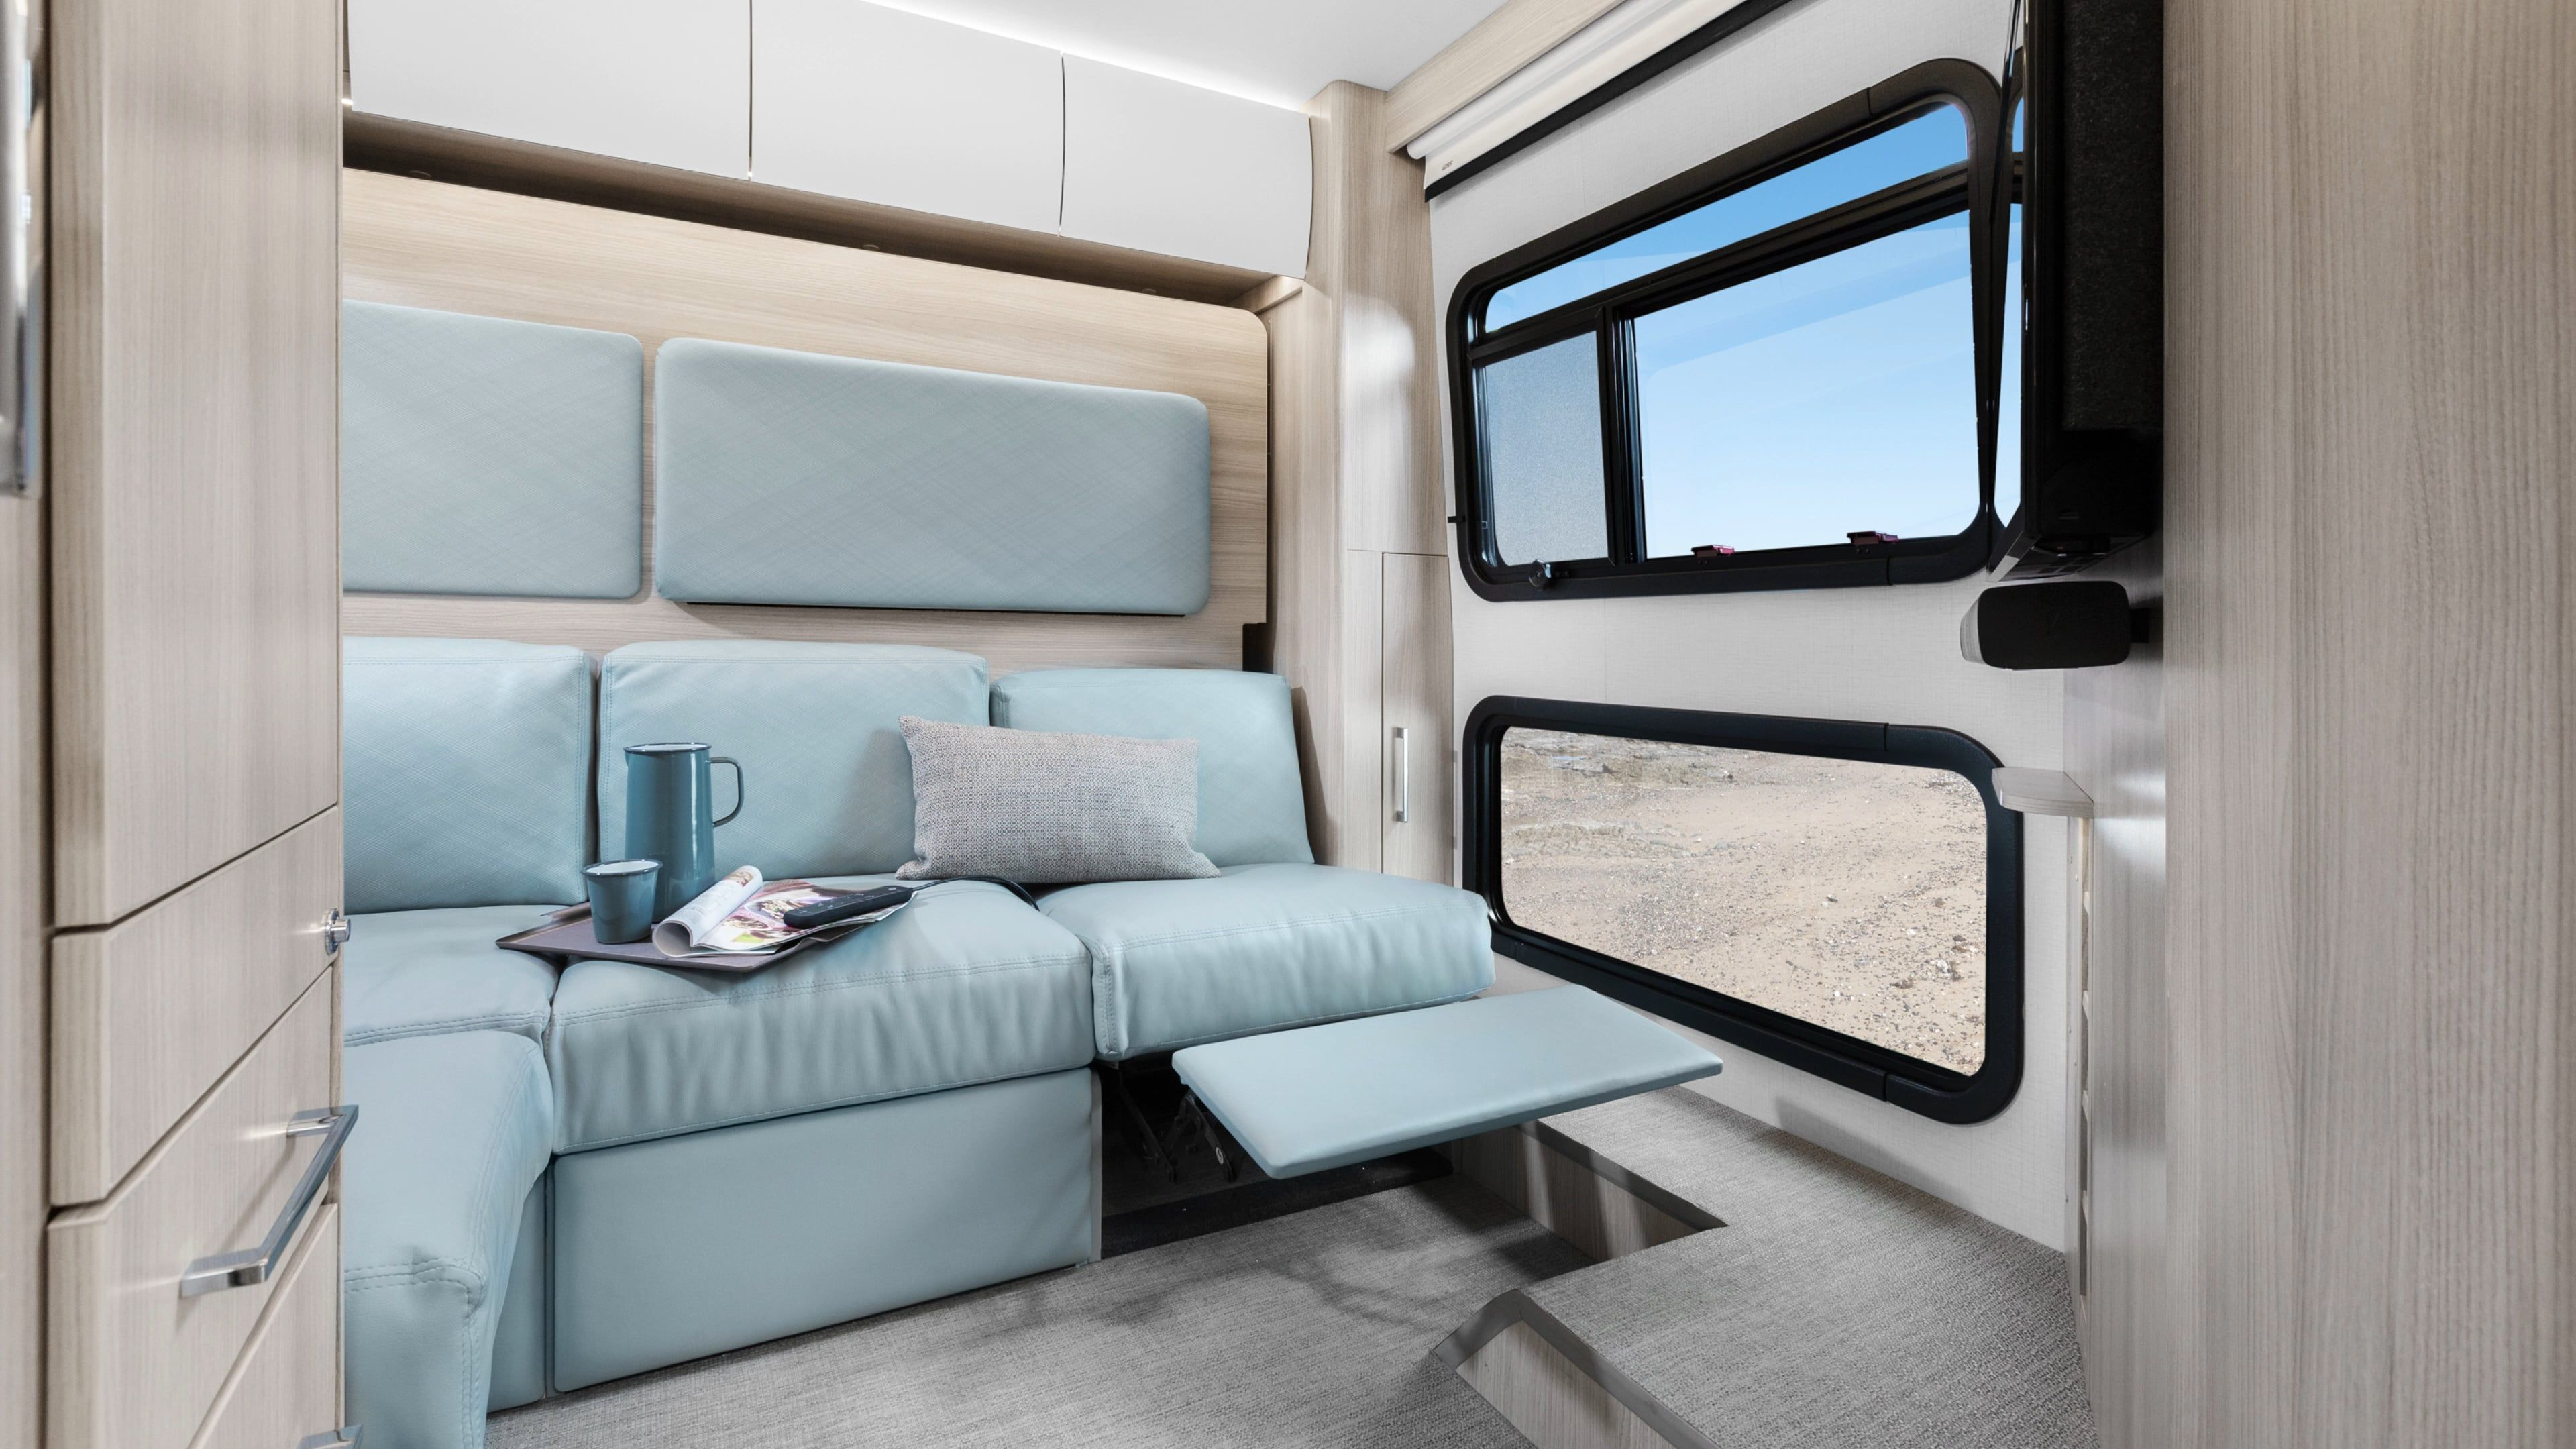 Unity Rear Lounge Leisure travel vans, Space saving